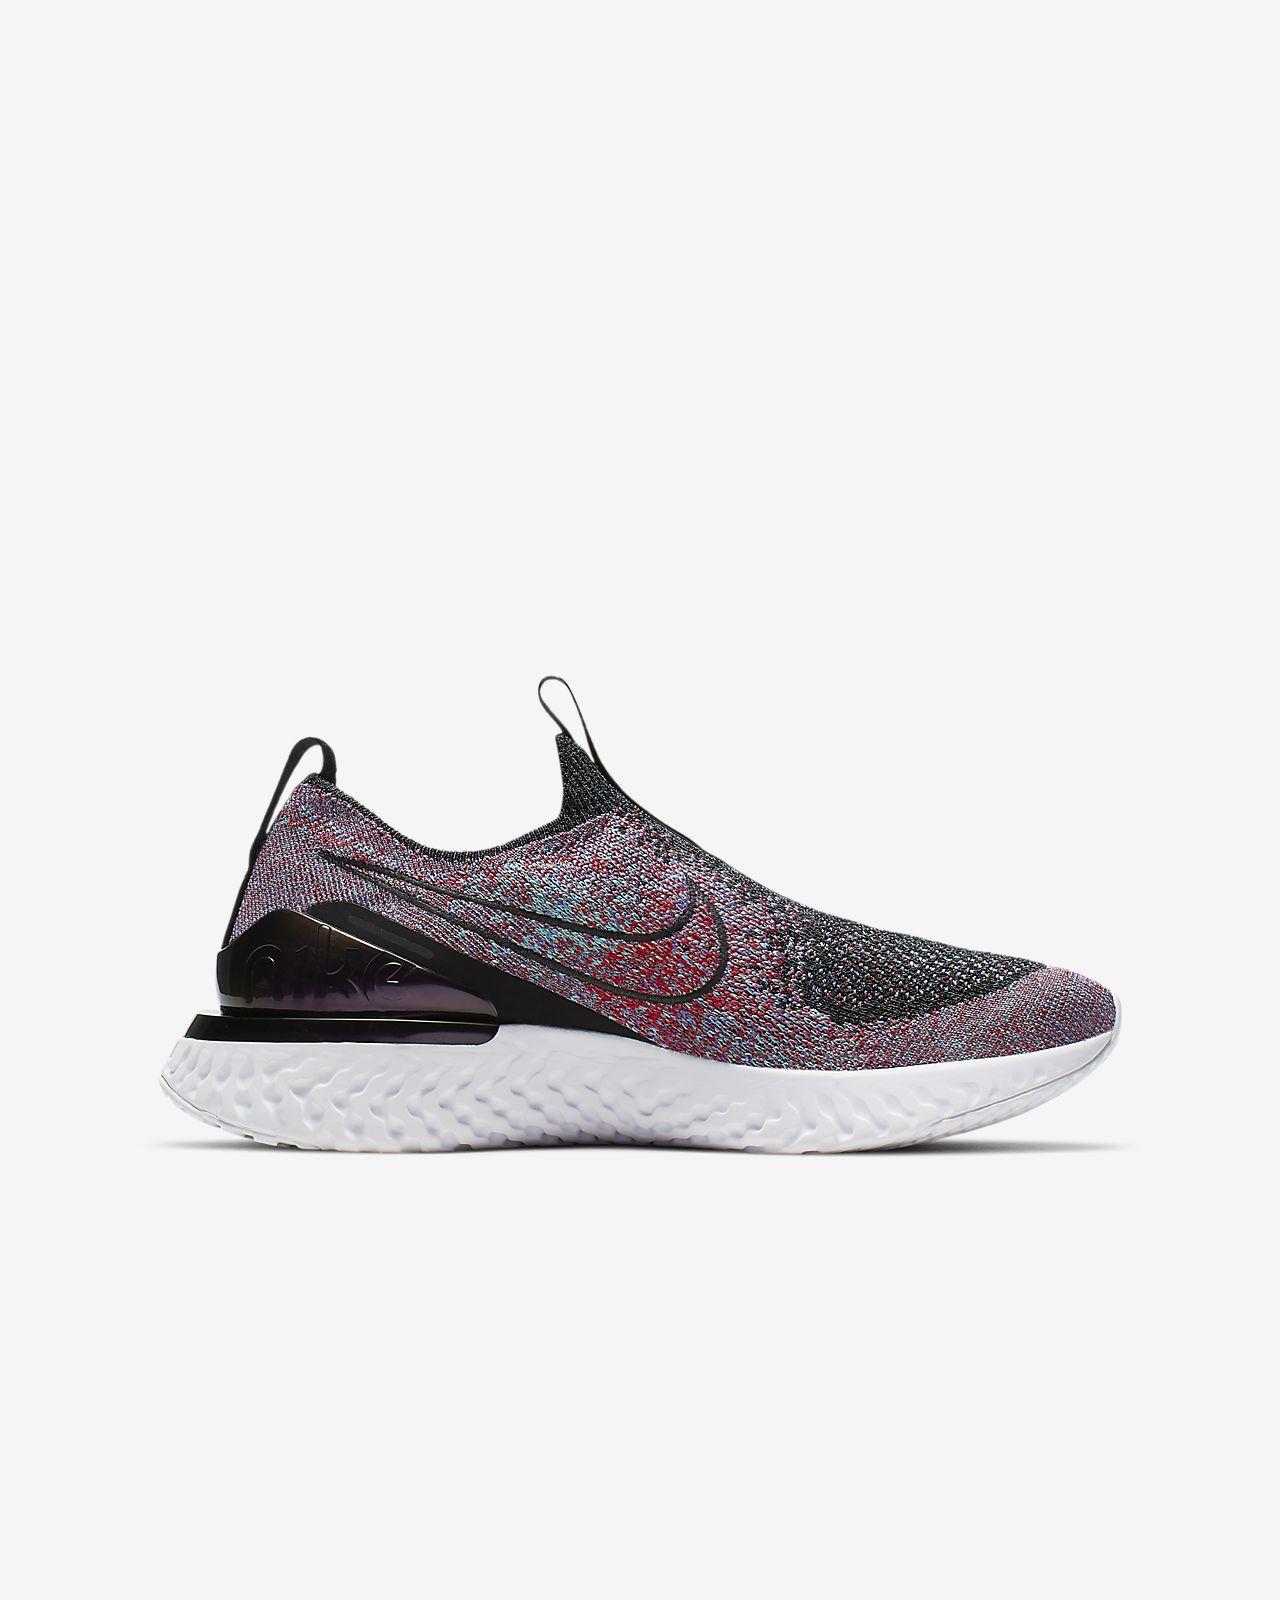 b4419b0af0e0 Nike Epic Phantom React Flyknit Big Kids  Running Shoe. Nike.com